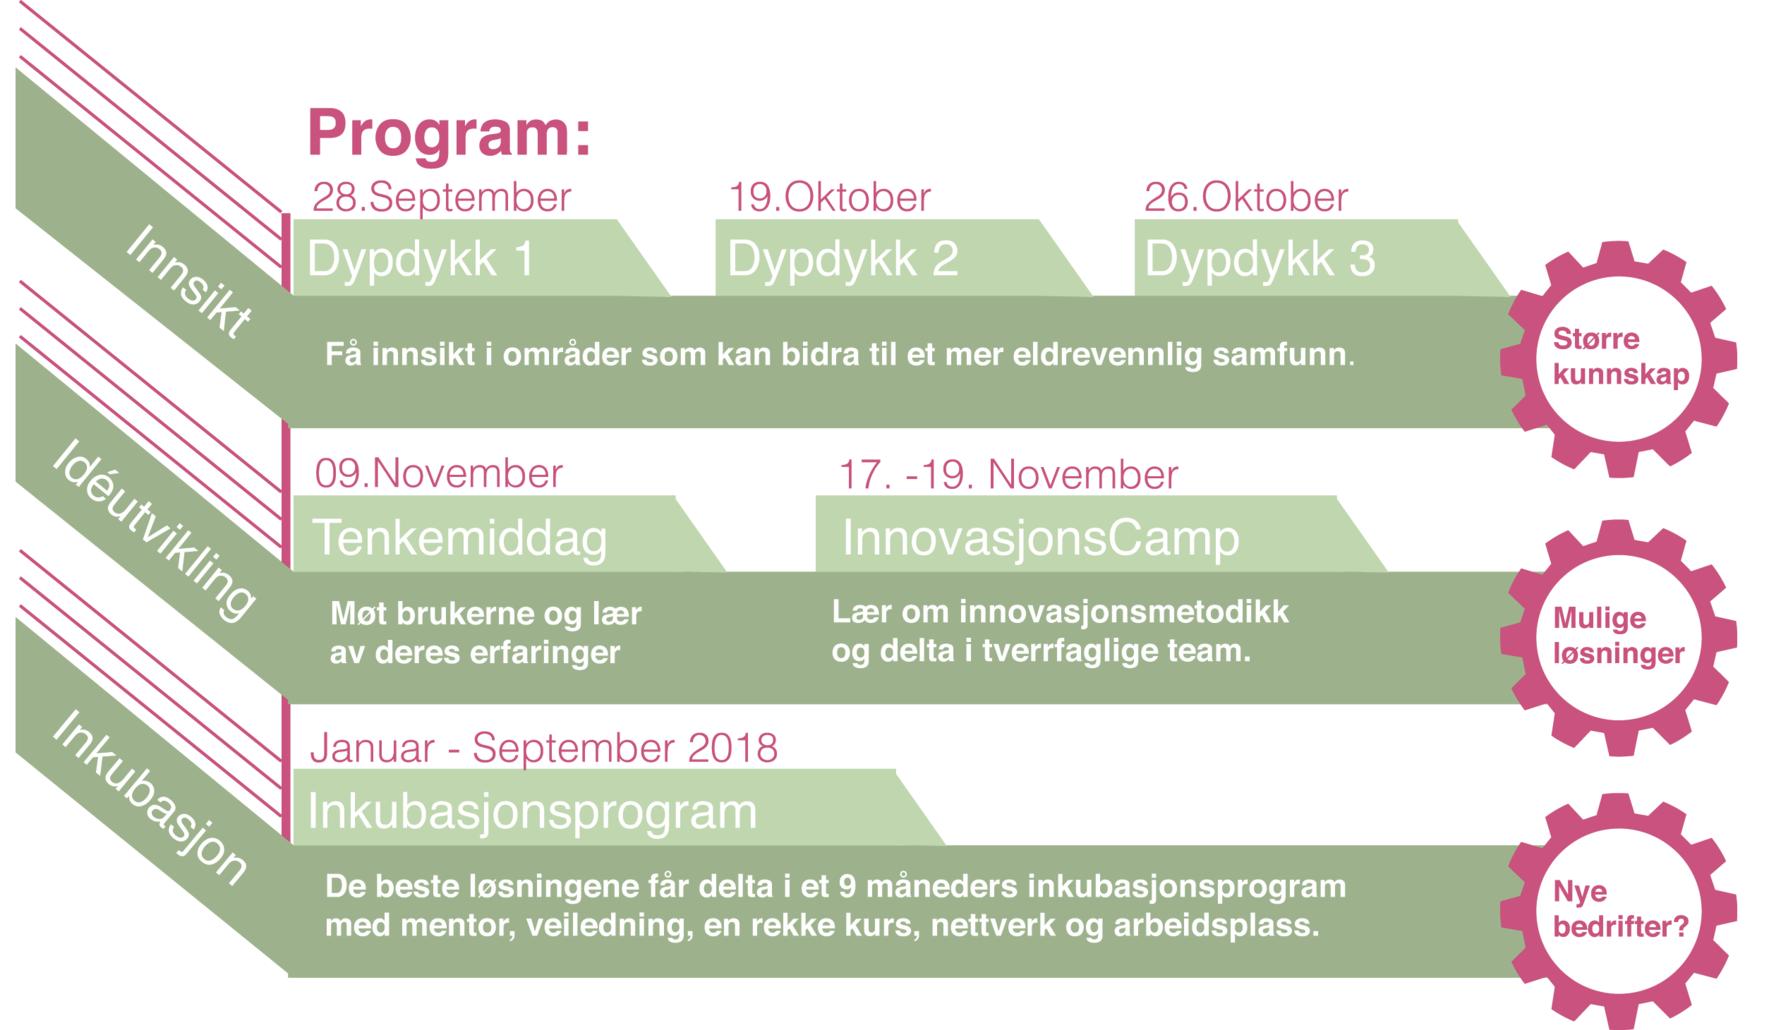 Web_Program_aretstema.png